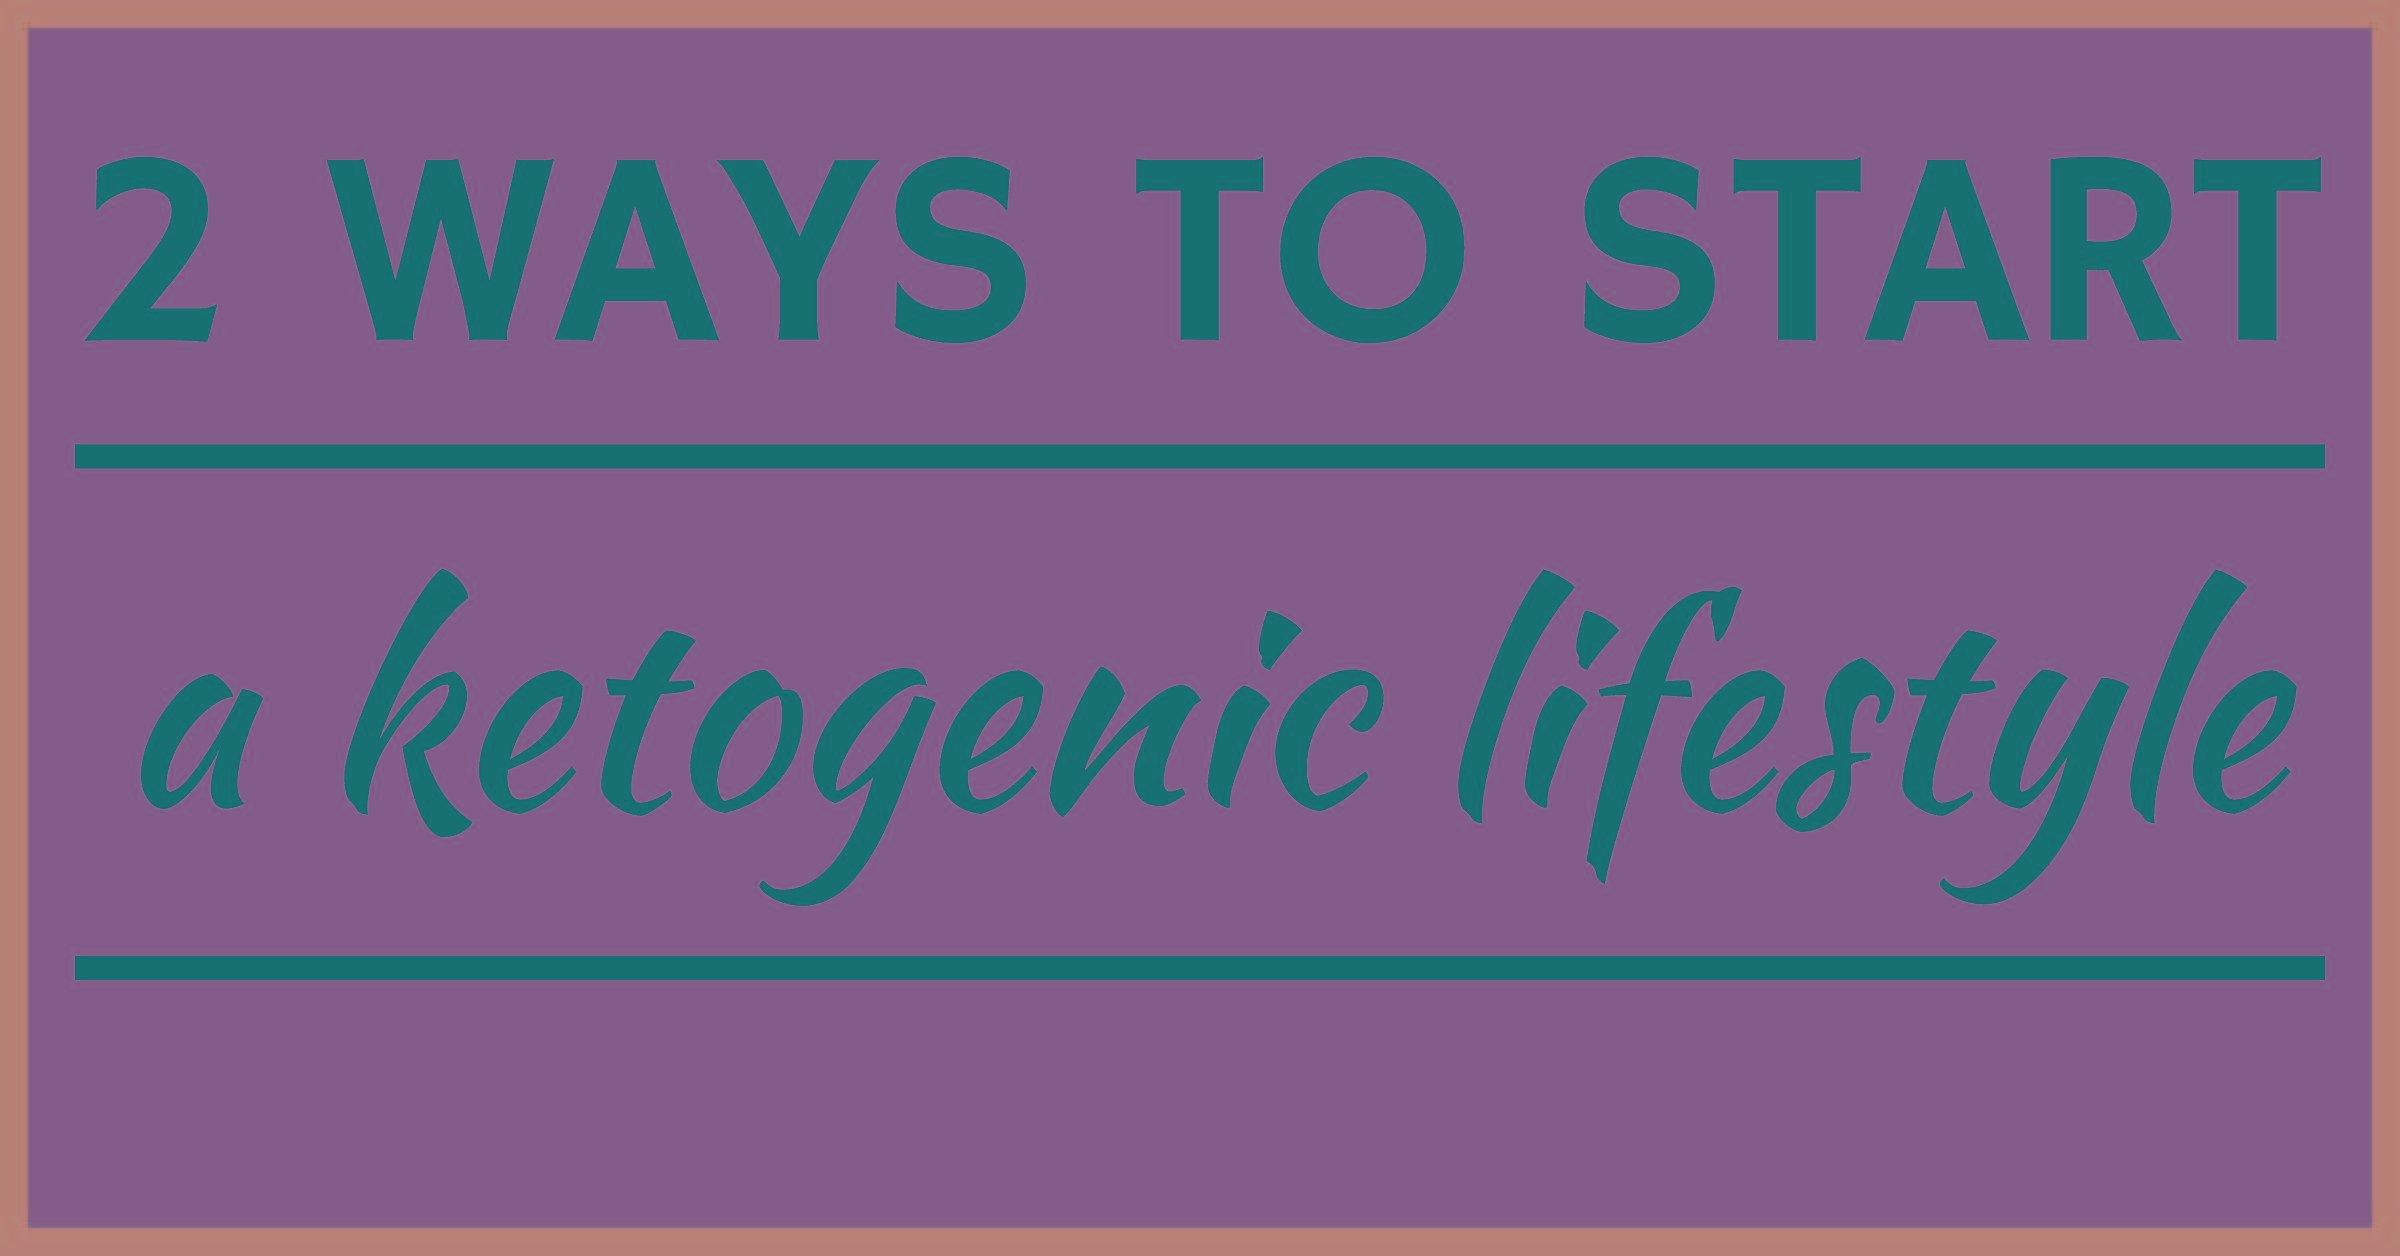 2 Ways To Start A Ketogenic Lifestyle